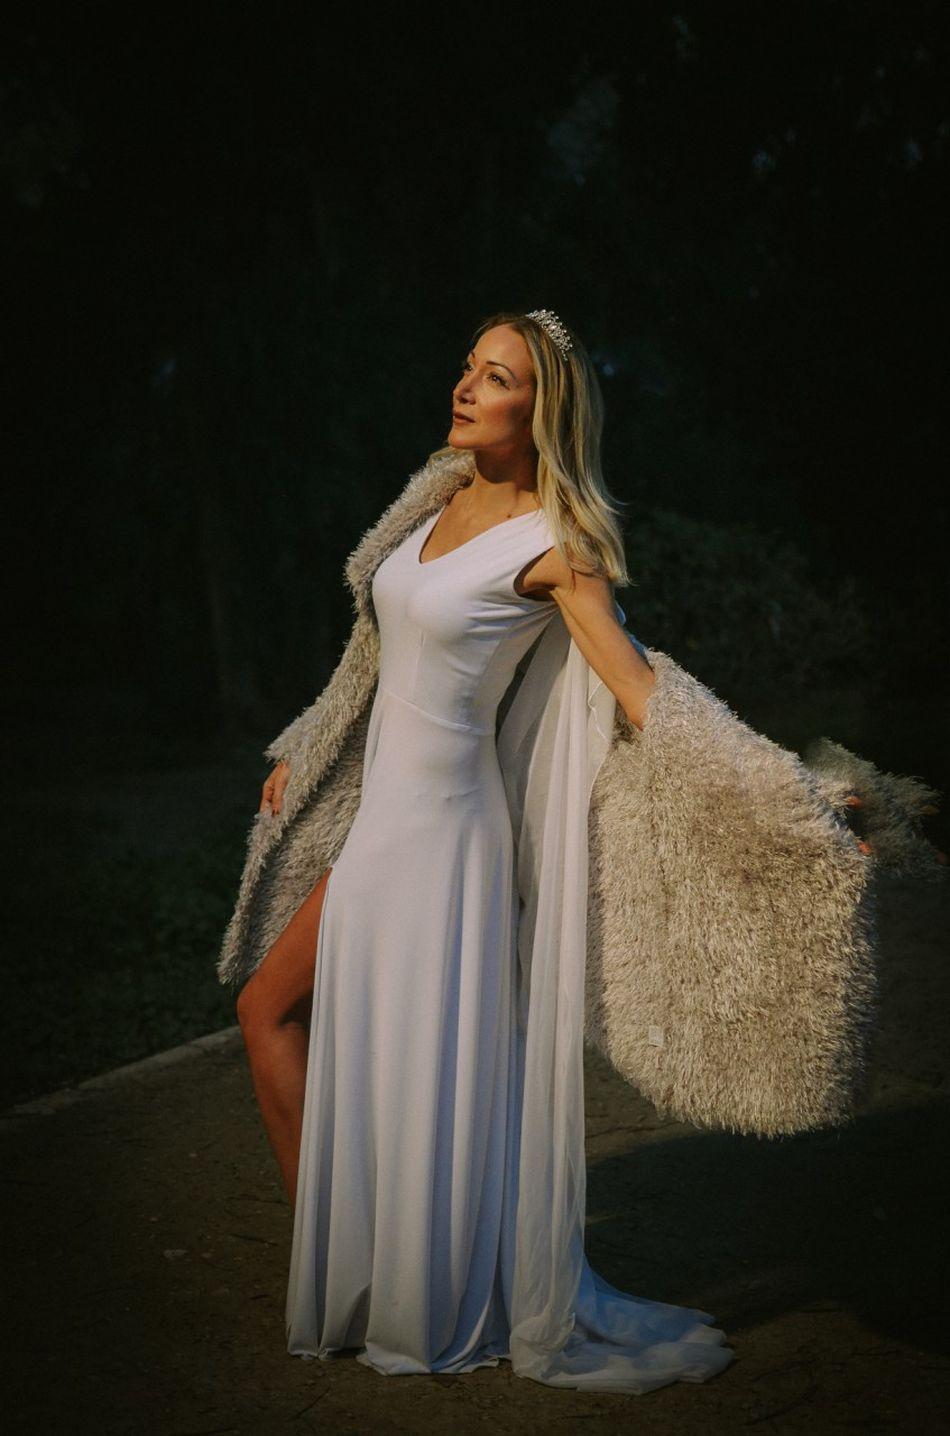 Diva♥ Beautiful Woman Cyprus Blond Hair Nicosia Nightphotography